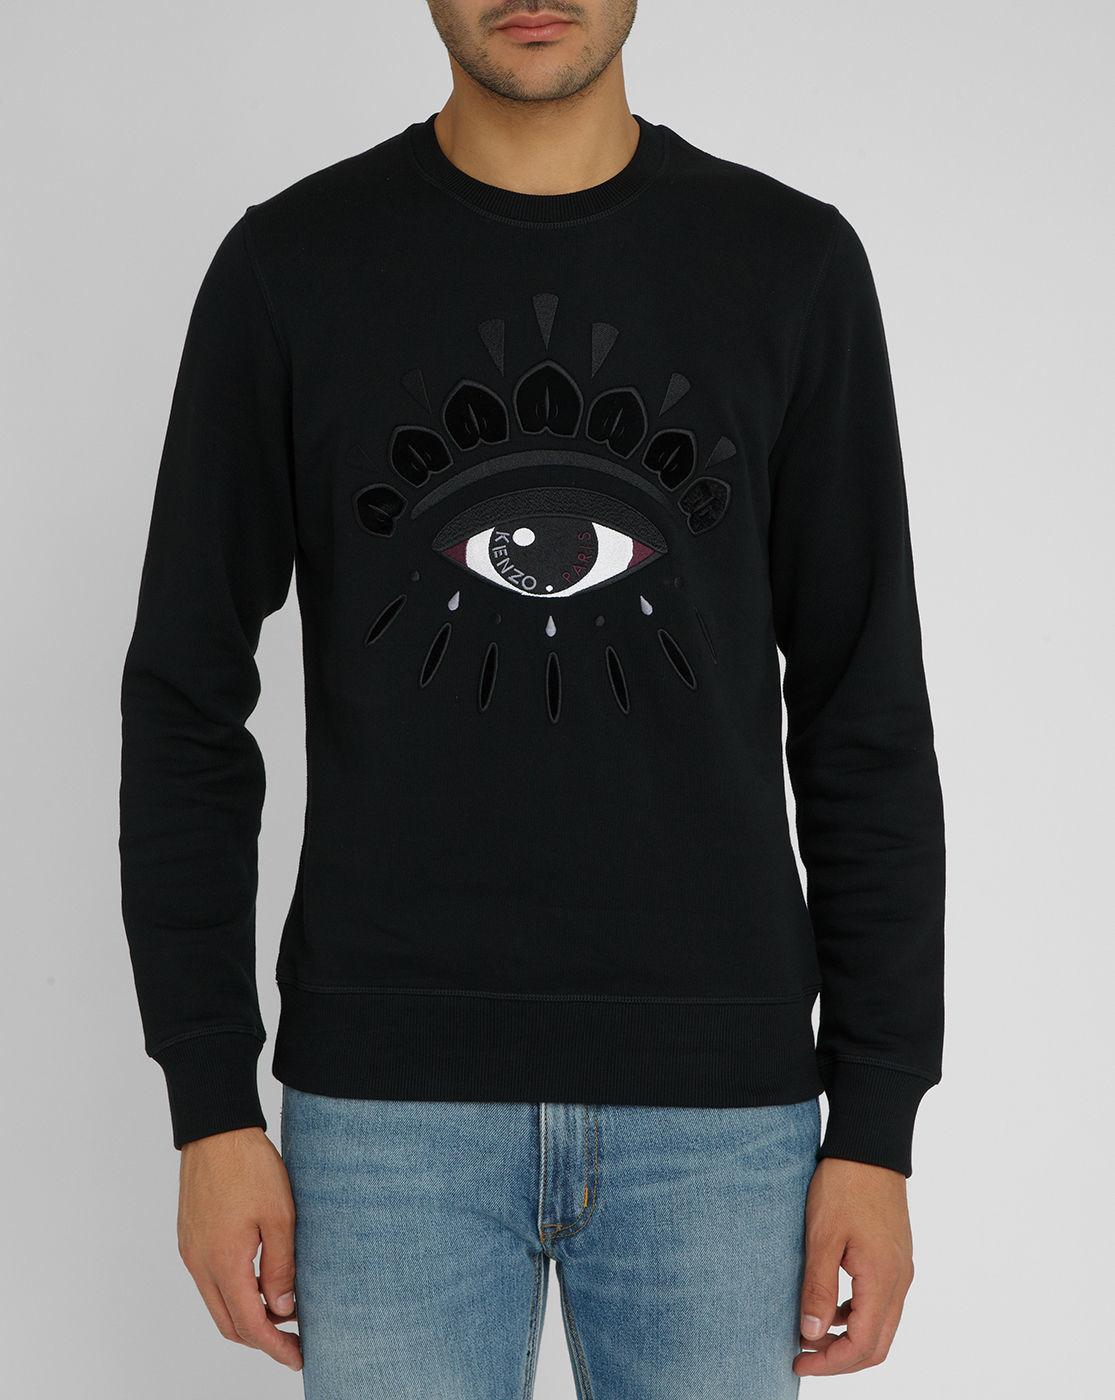 Kenzo Black Eye Logo Round neck Sweatshirt In For